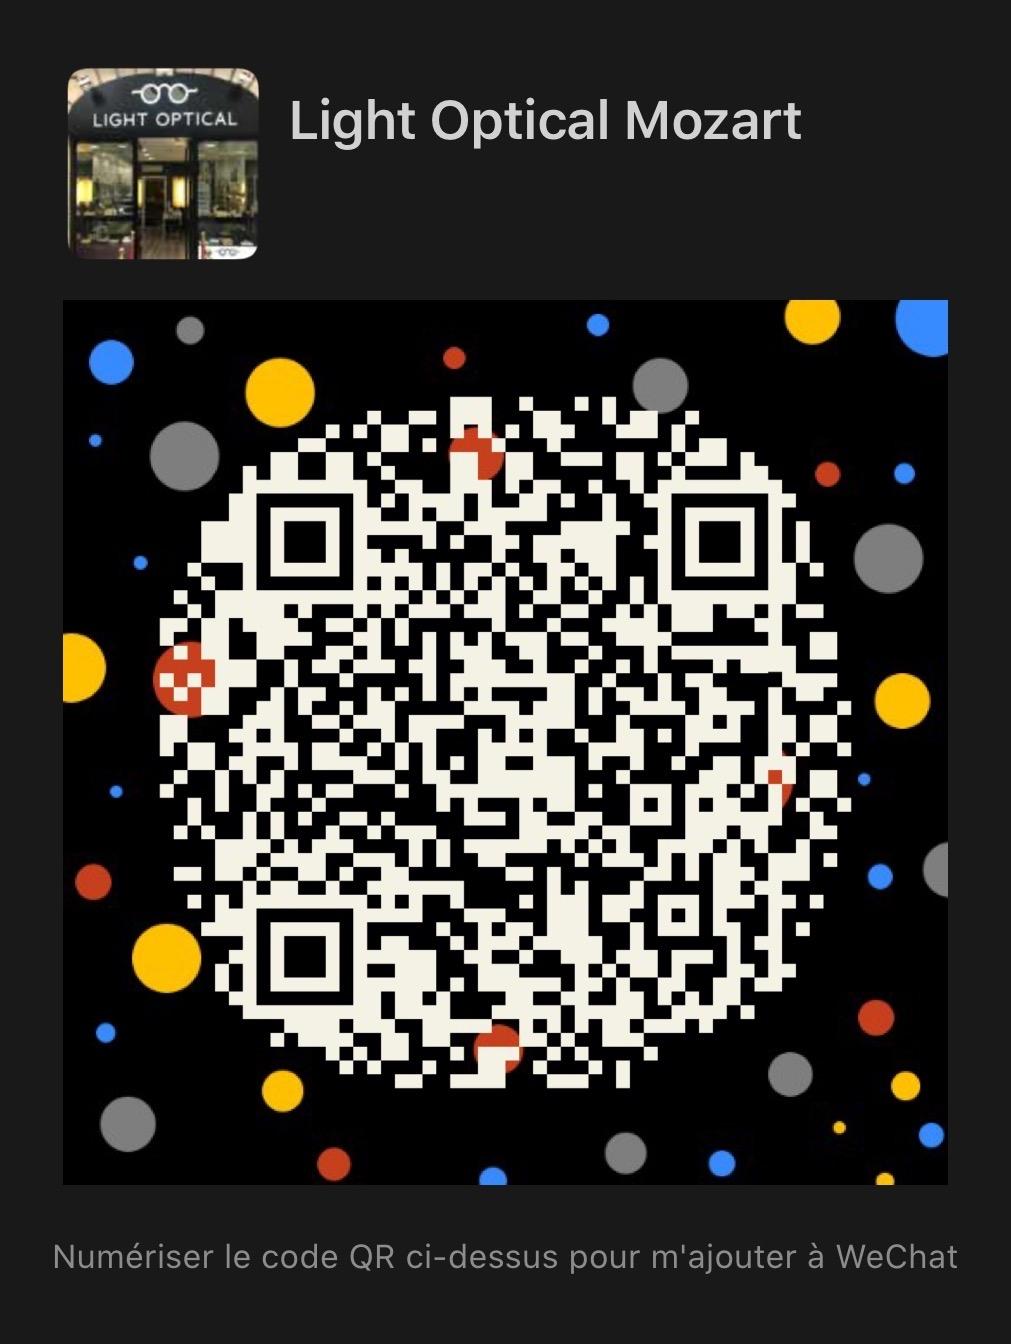 IMG_3792 (1).JPG